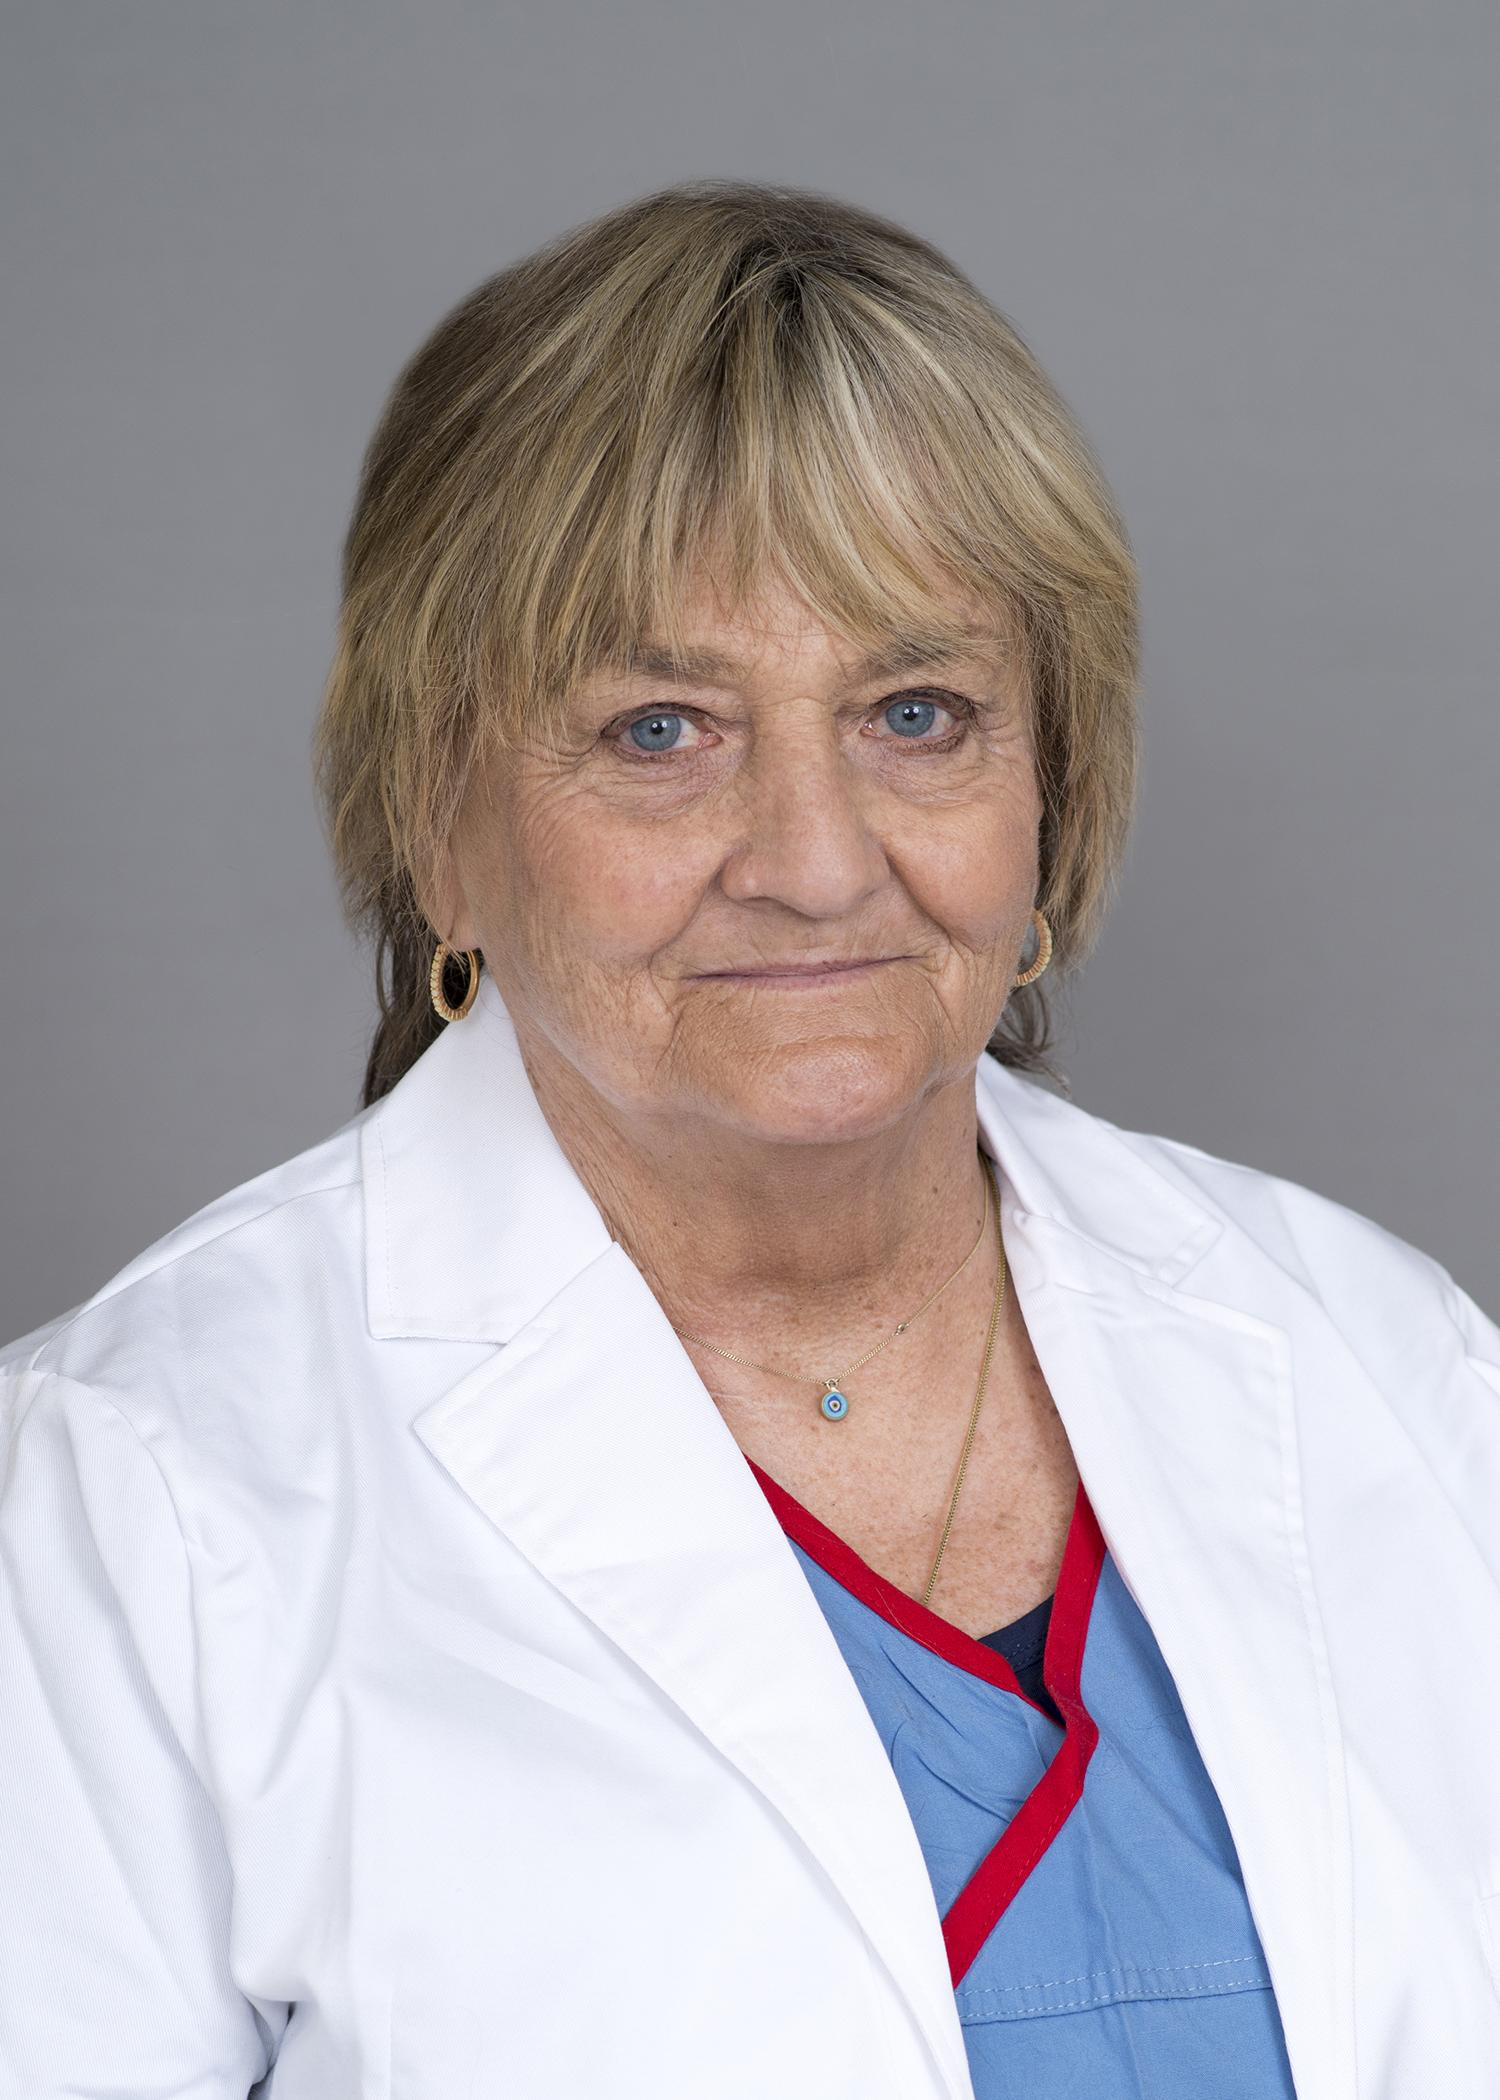 Barbara Fulbright